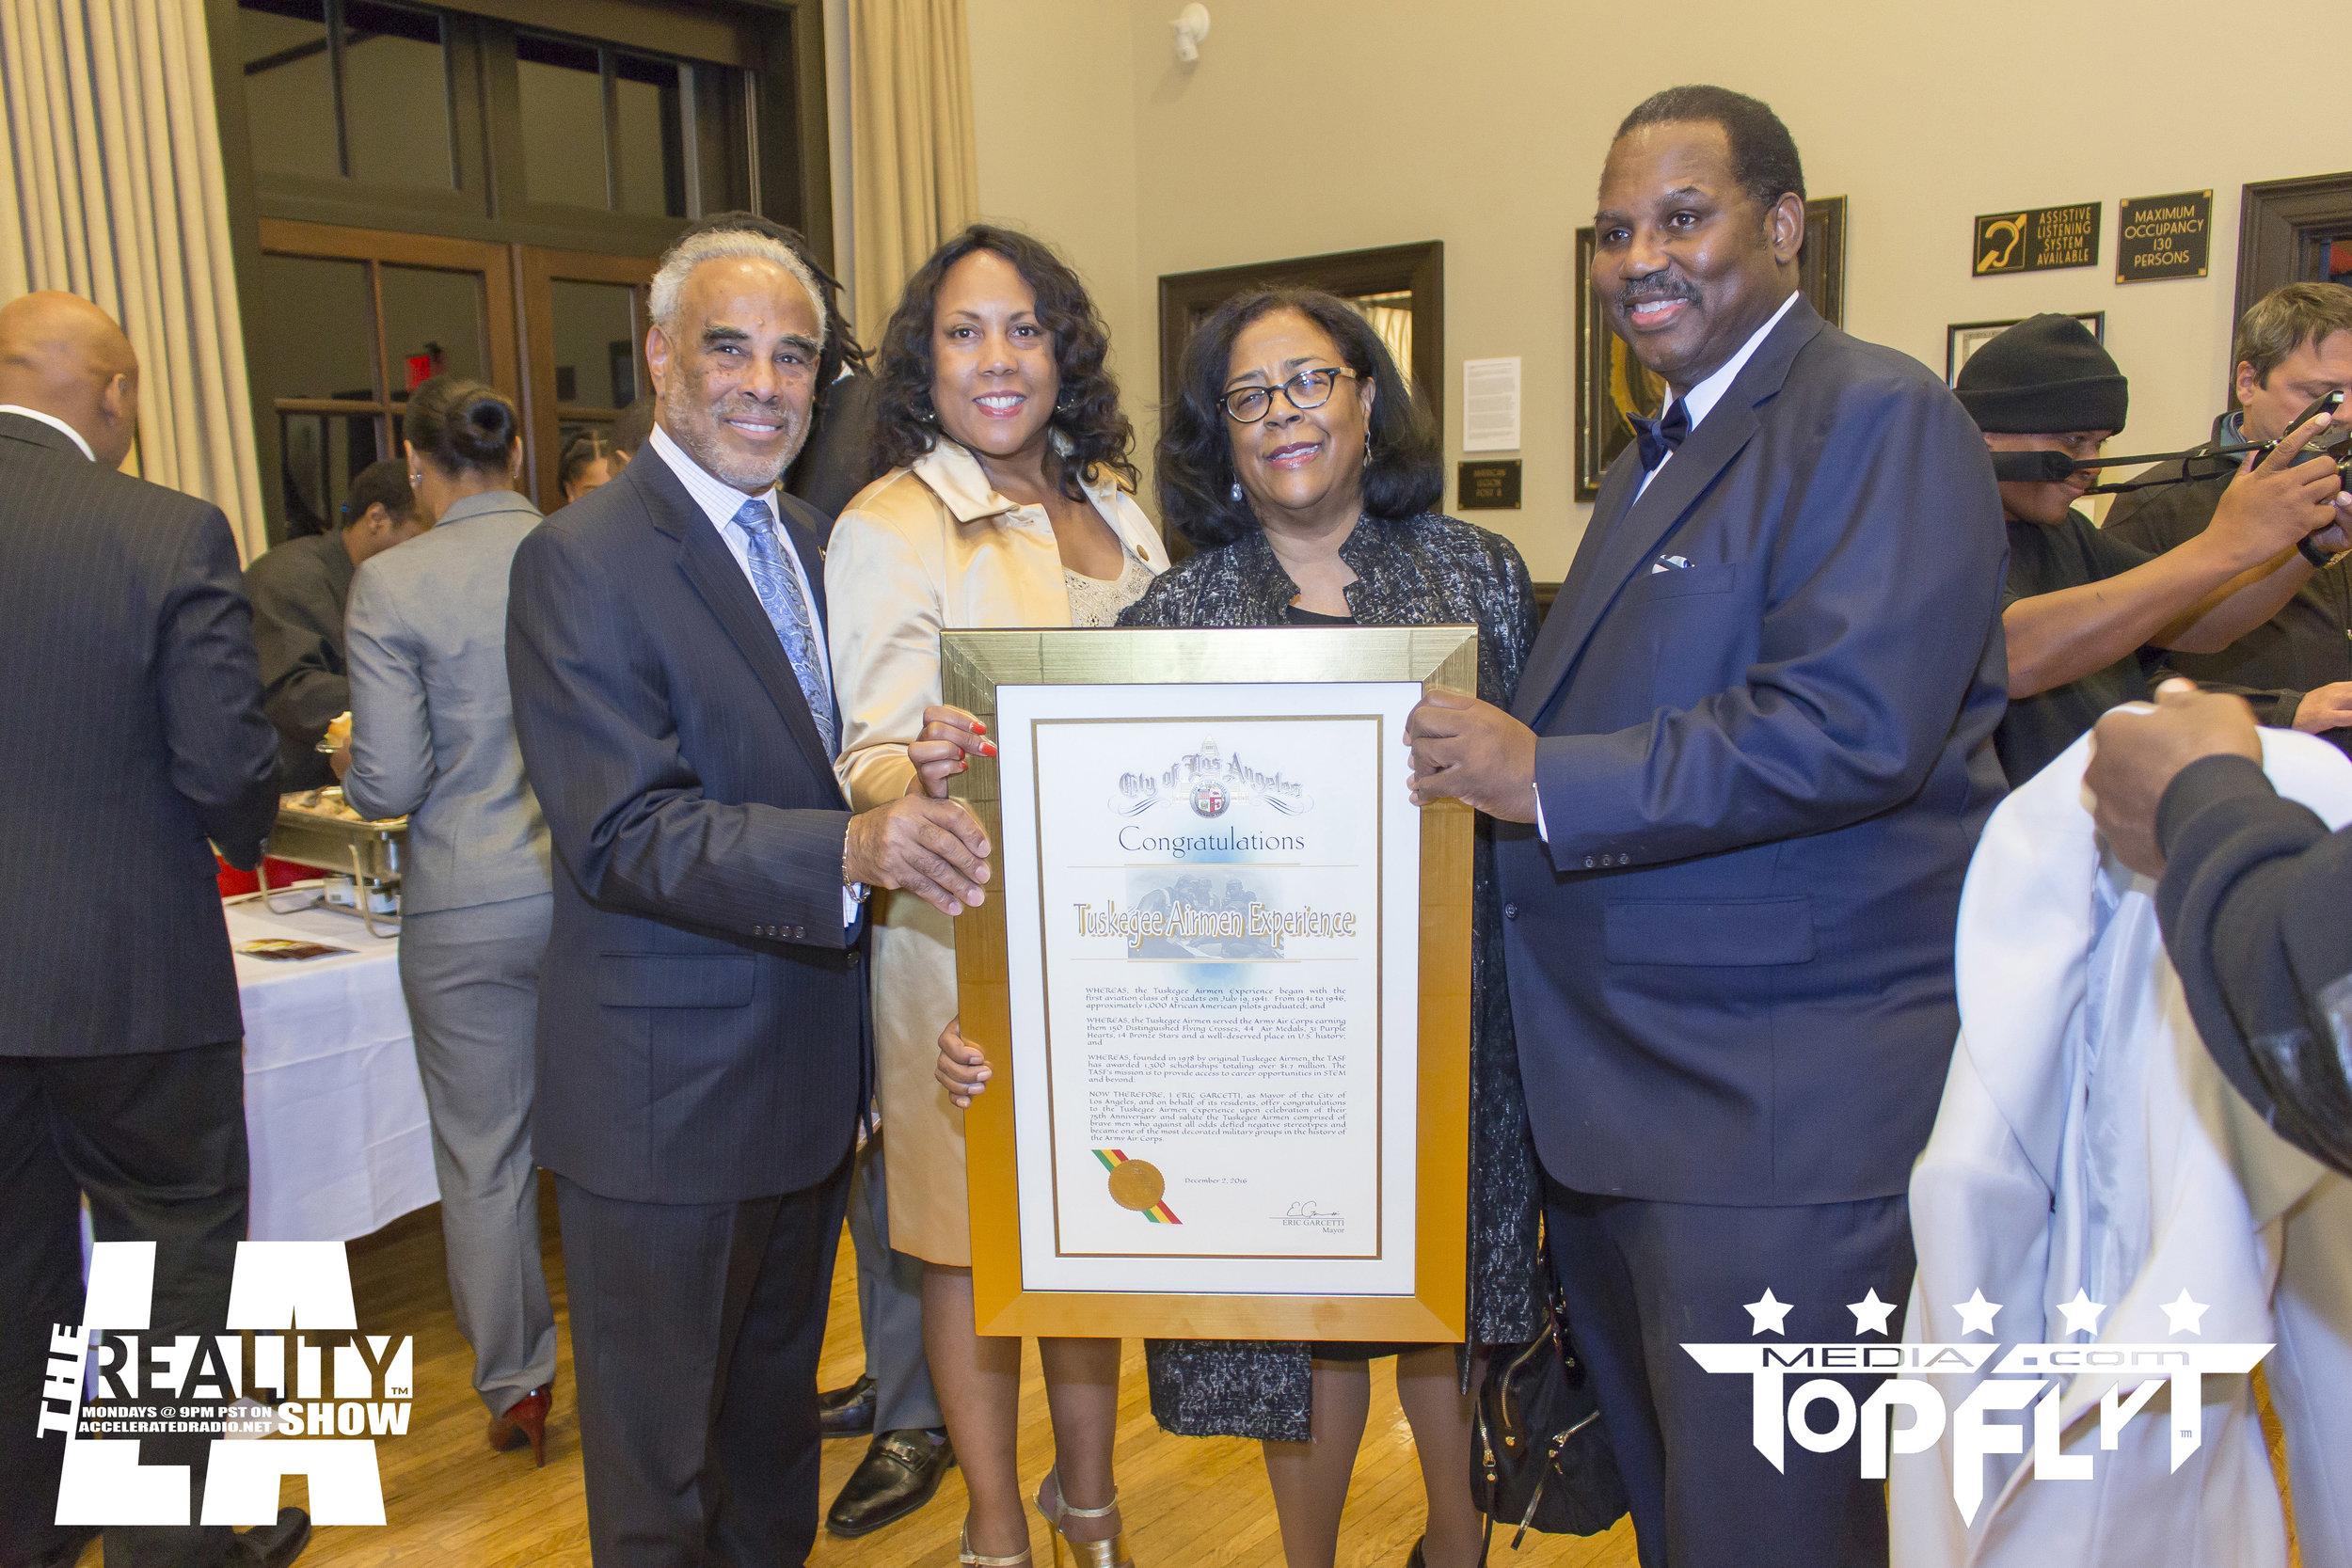 The Reality Show LA - Tuskegee Airmen 75th Anniversary VIP Reception_121.jpg